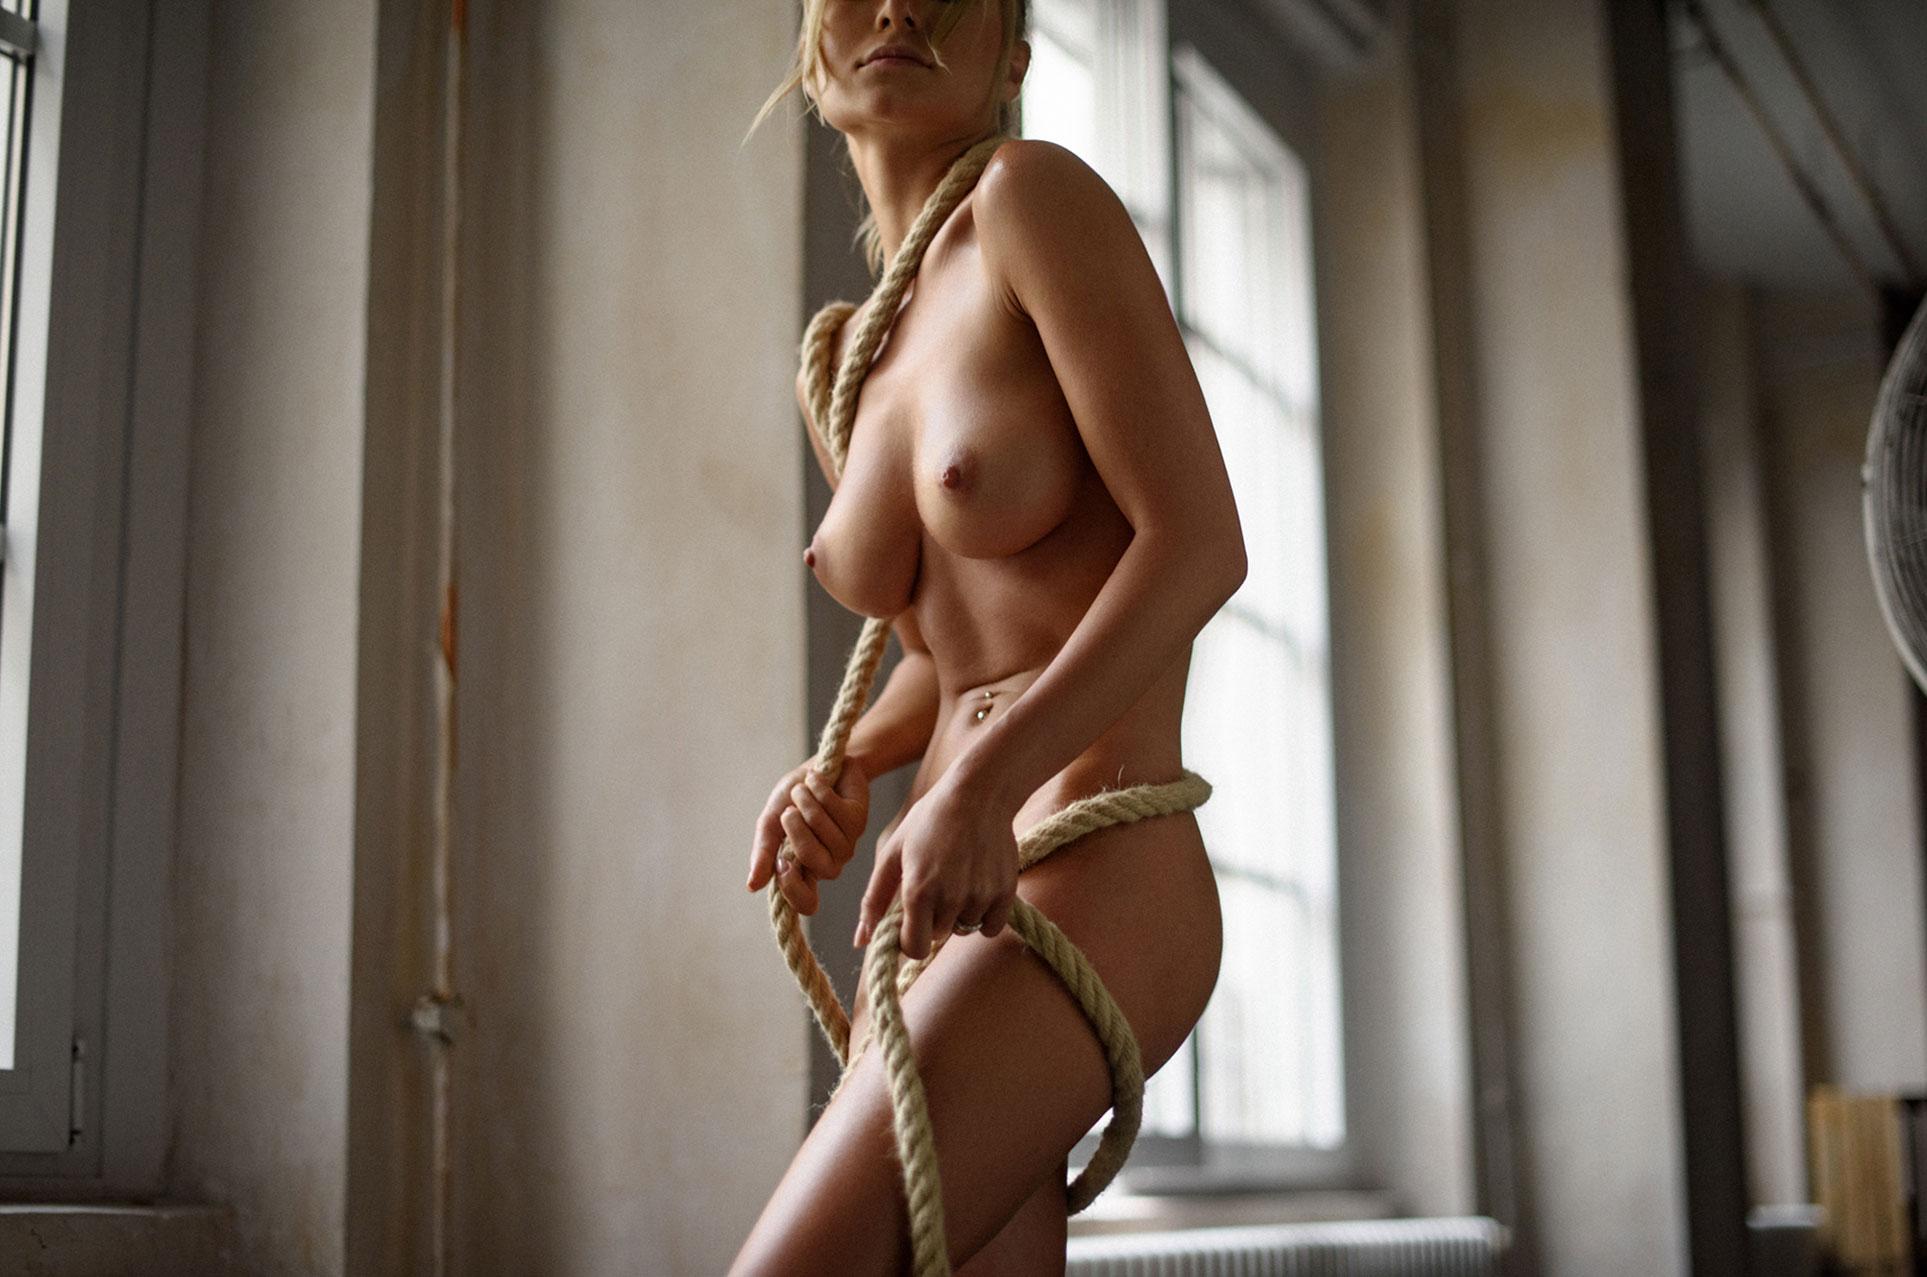 Тренируемся с Дашей Литвин / Daria Lytvyn by Sacha Leyendecker - Body Workout